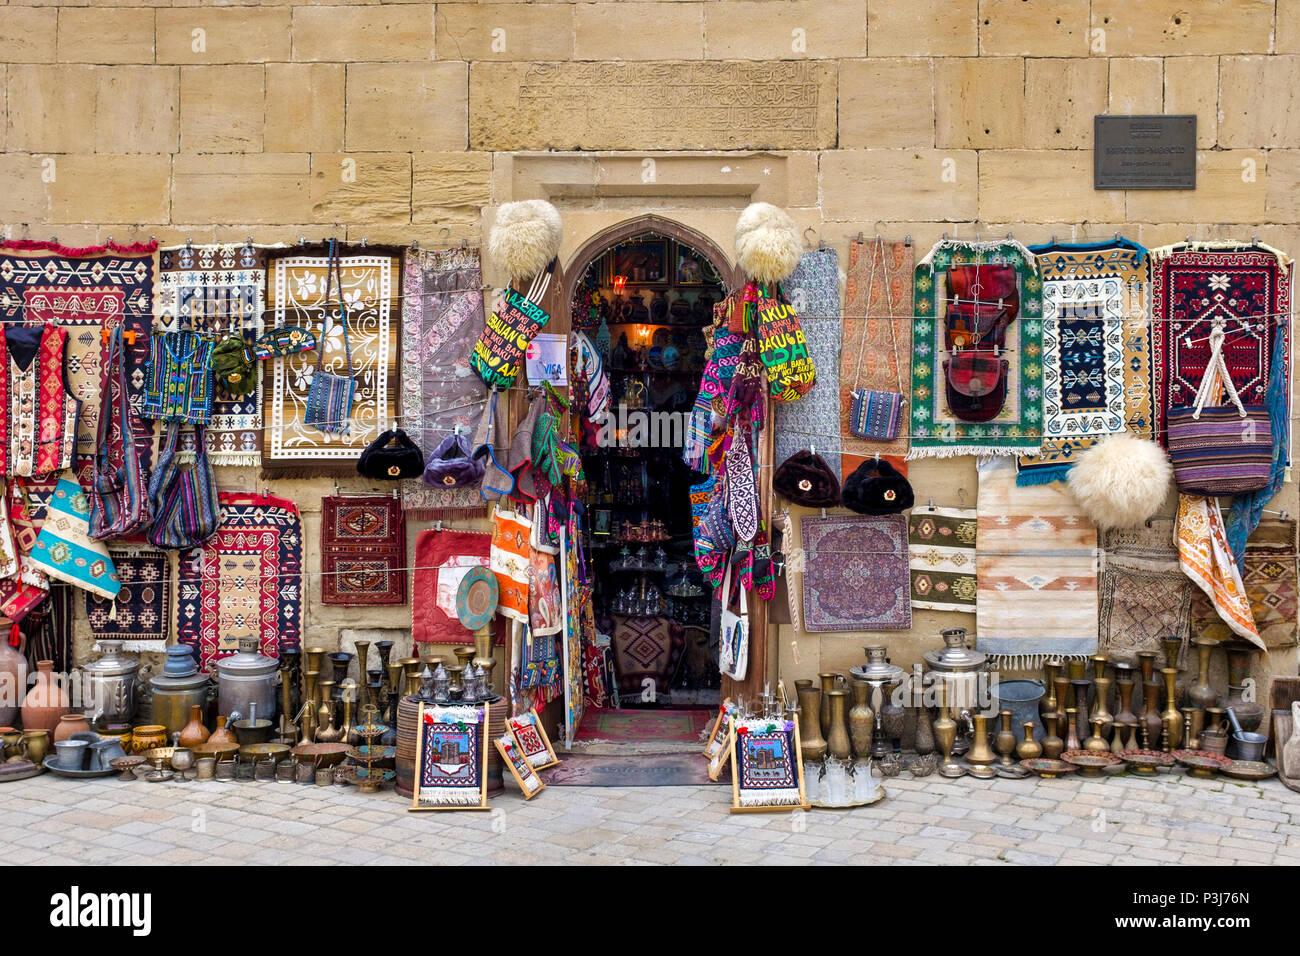 Azeri traditional shop in Icheri Sheher, Baku, Azerbaijan Stock Photo